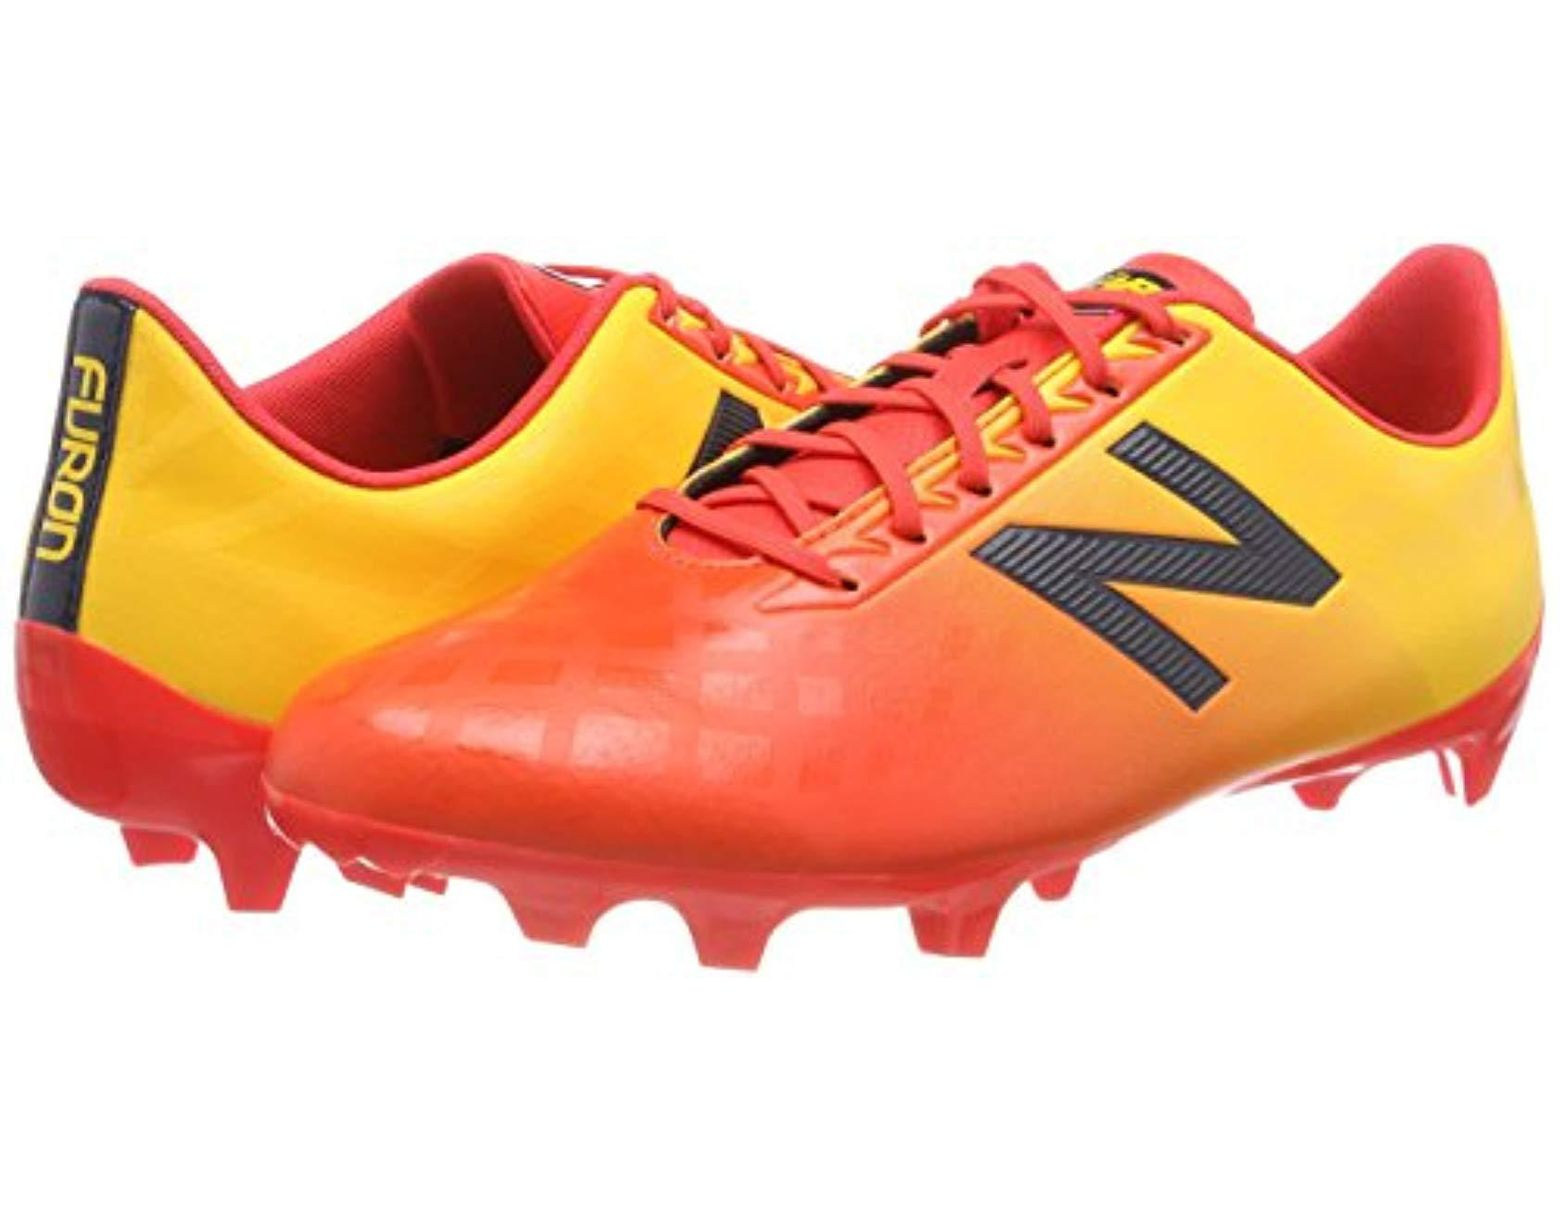 New Balance Visaro Pro 2.0 FG Senior Football Boot Blue